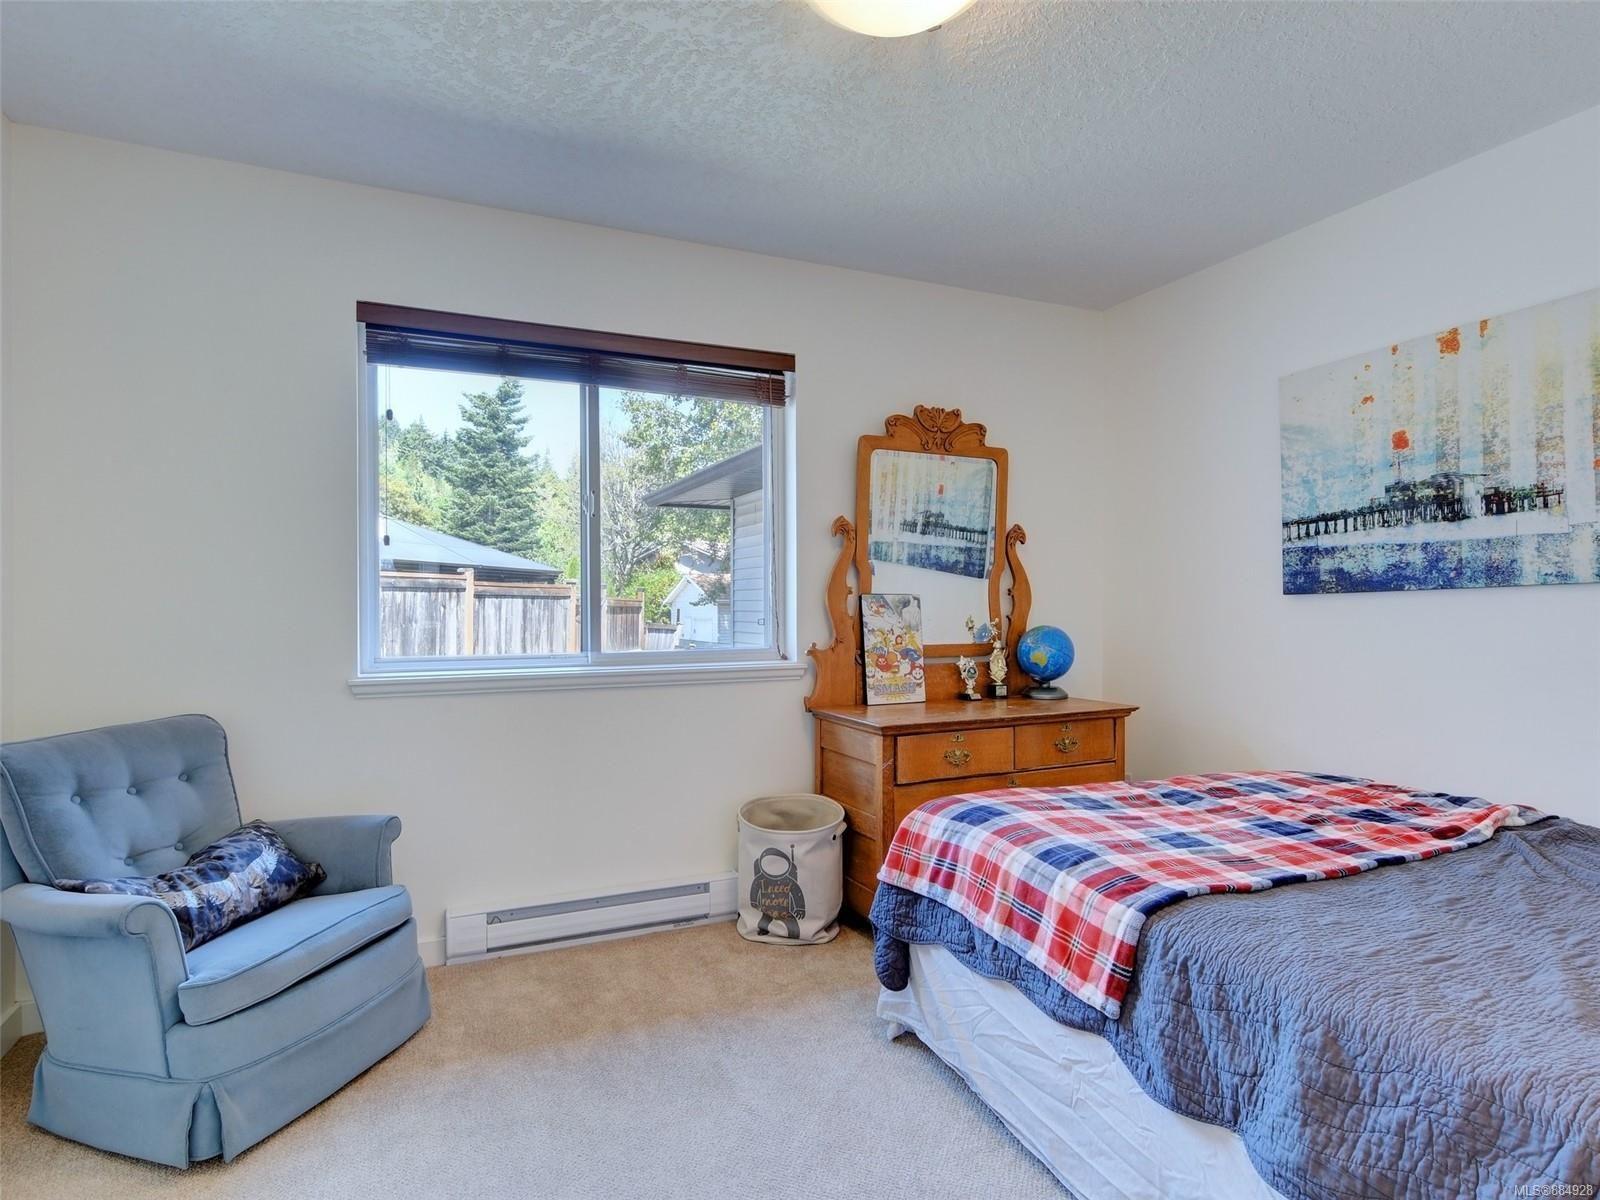 Photo 18: Photos: 6896 Beaton Rd in : Sk Broomhill Half Duplex for sale (Sooke)  : MLS®# 884928